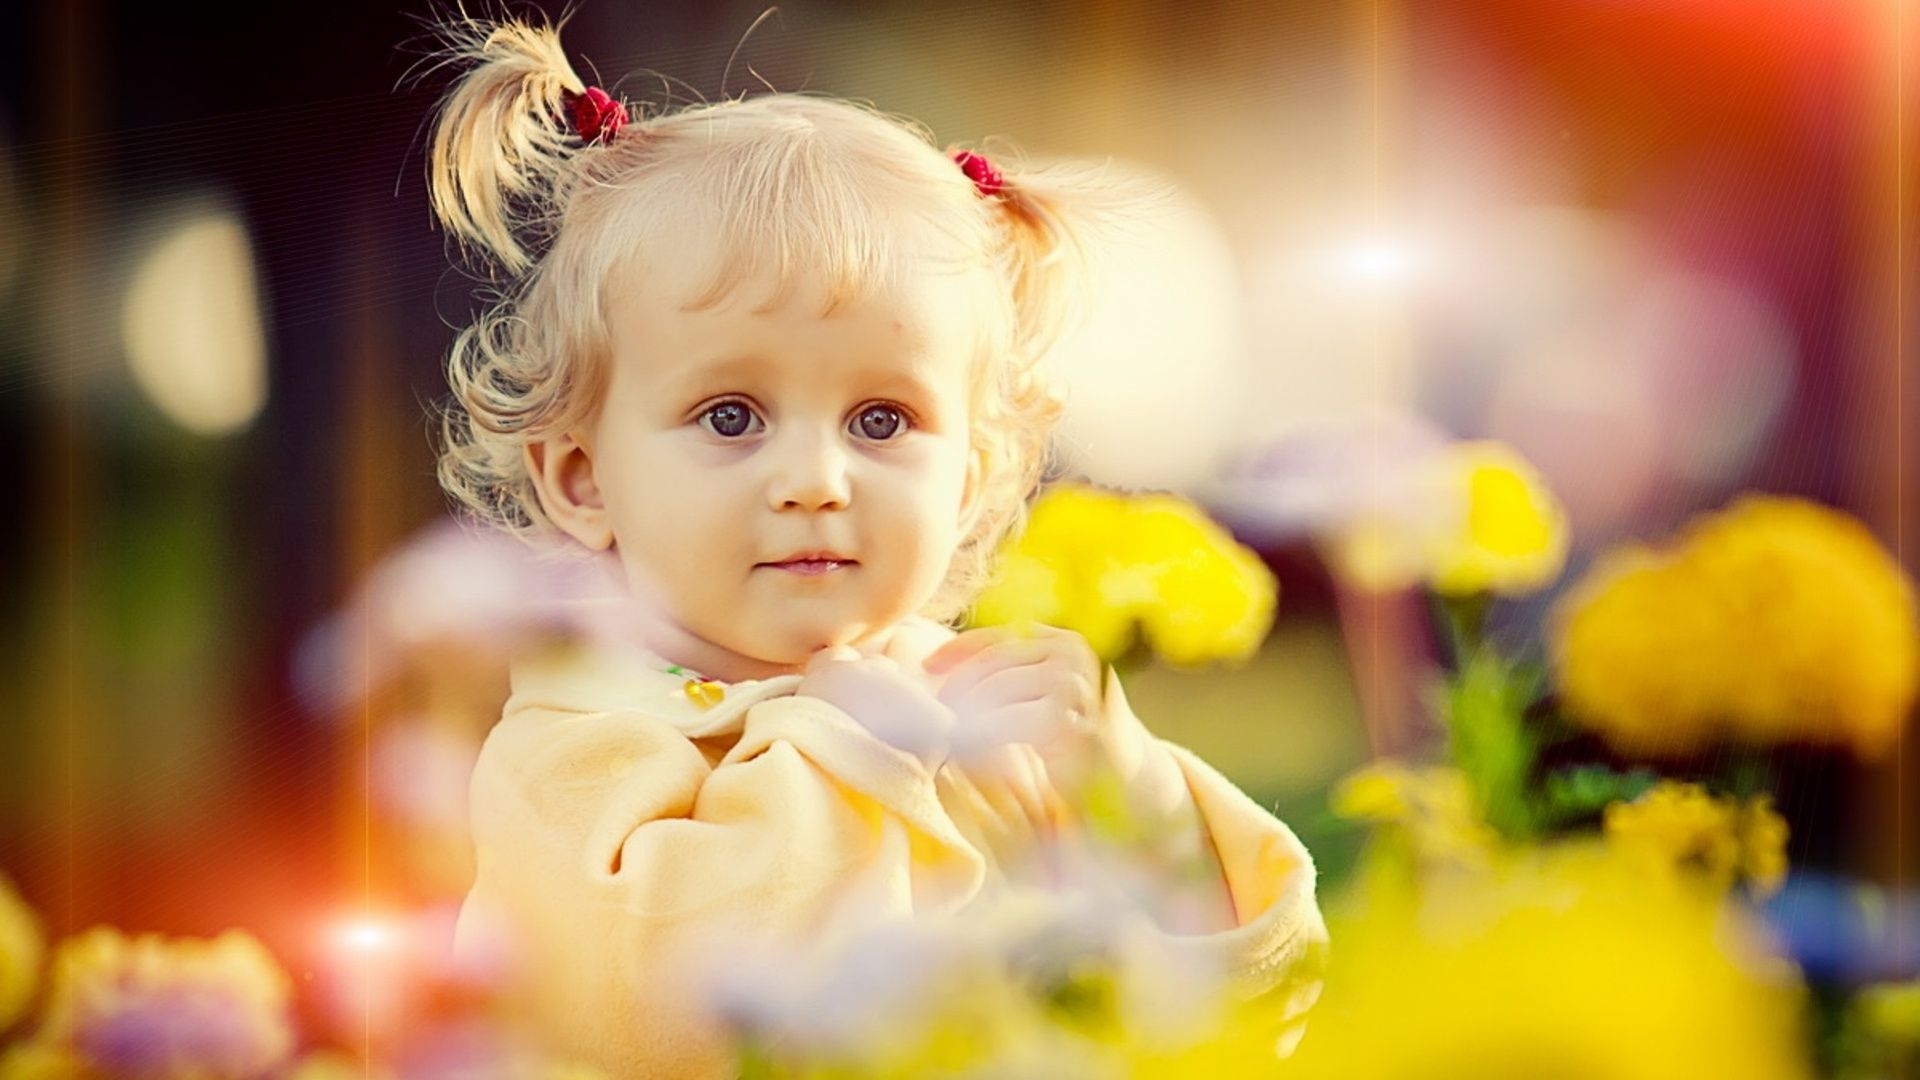 Baby Girl Beautiful Hair Style Baby Girl Wallpaper Baby Girl Hairstyles Baby Wallpaper